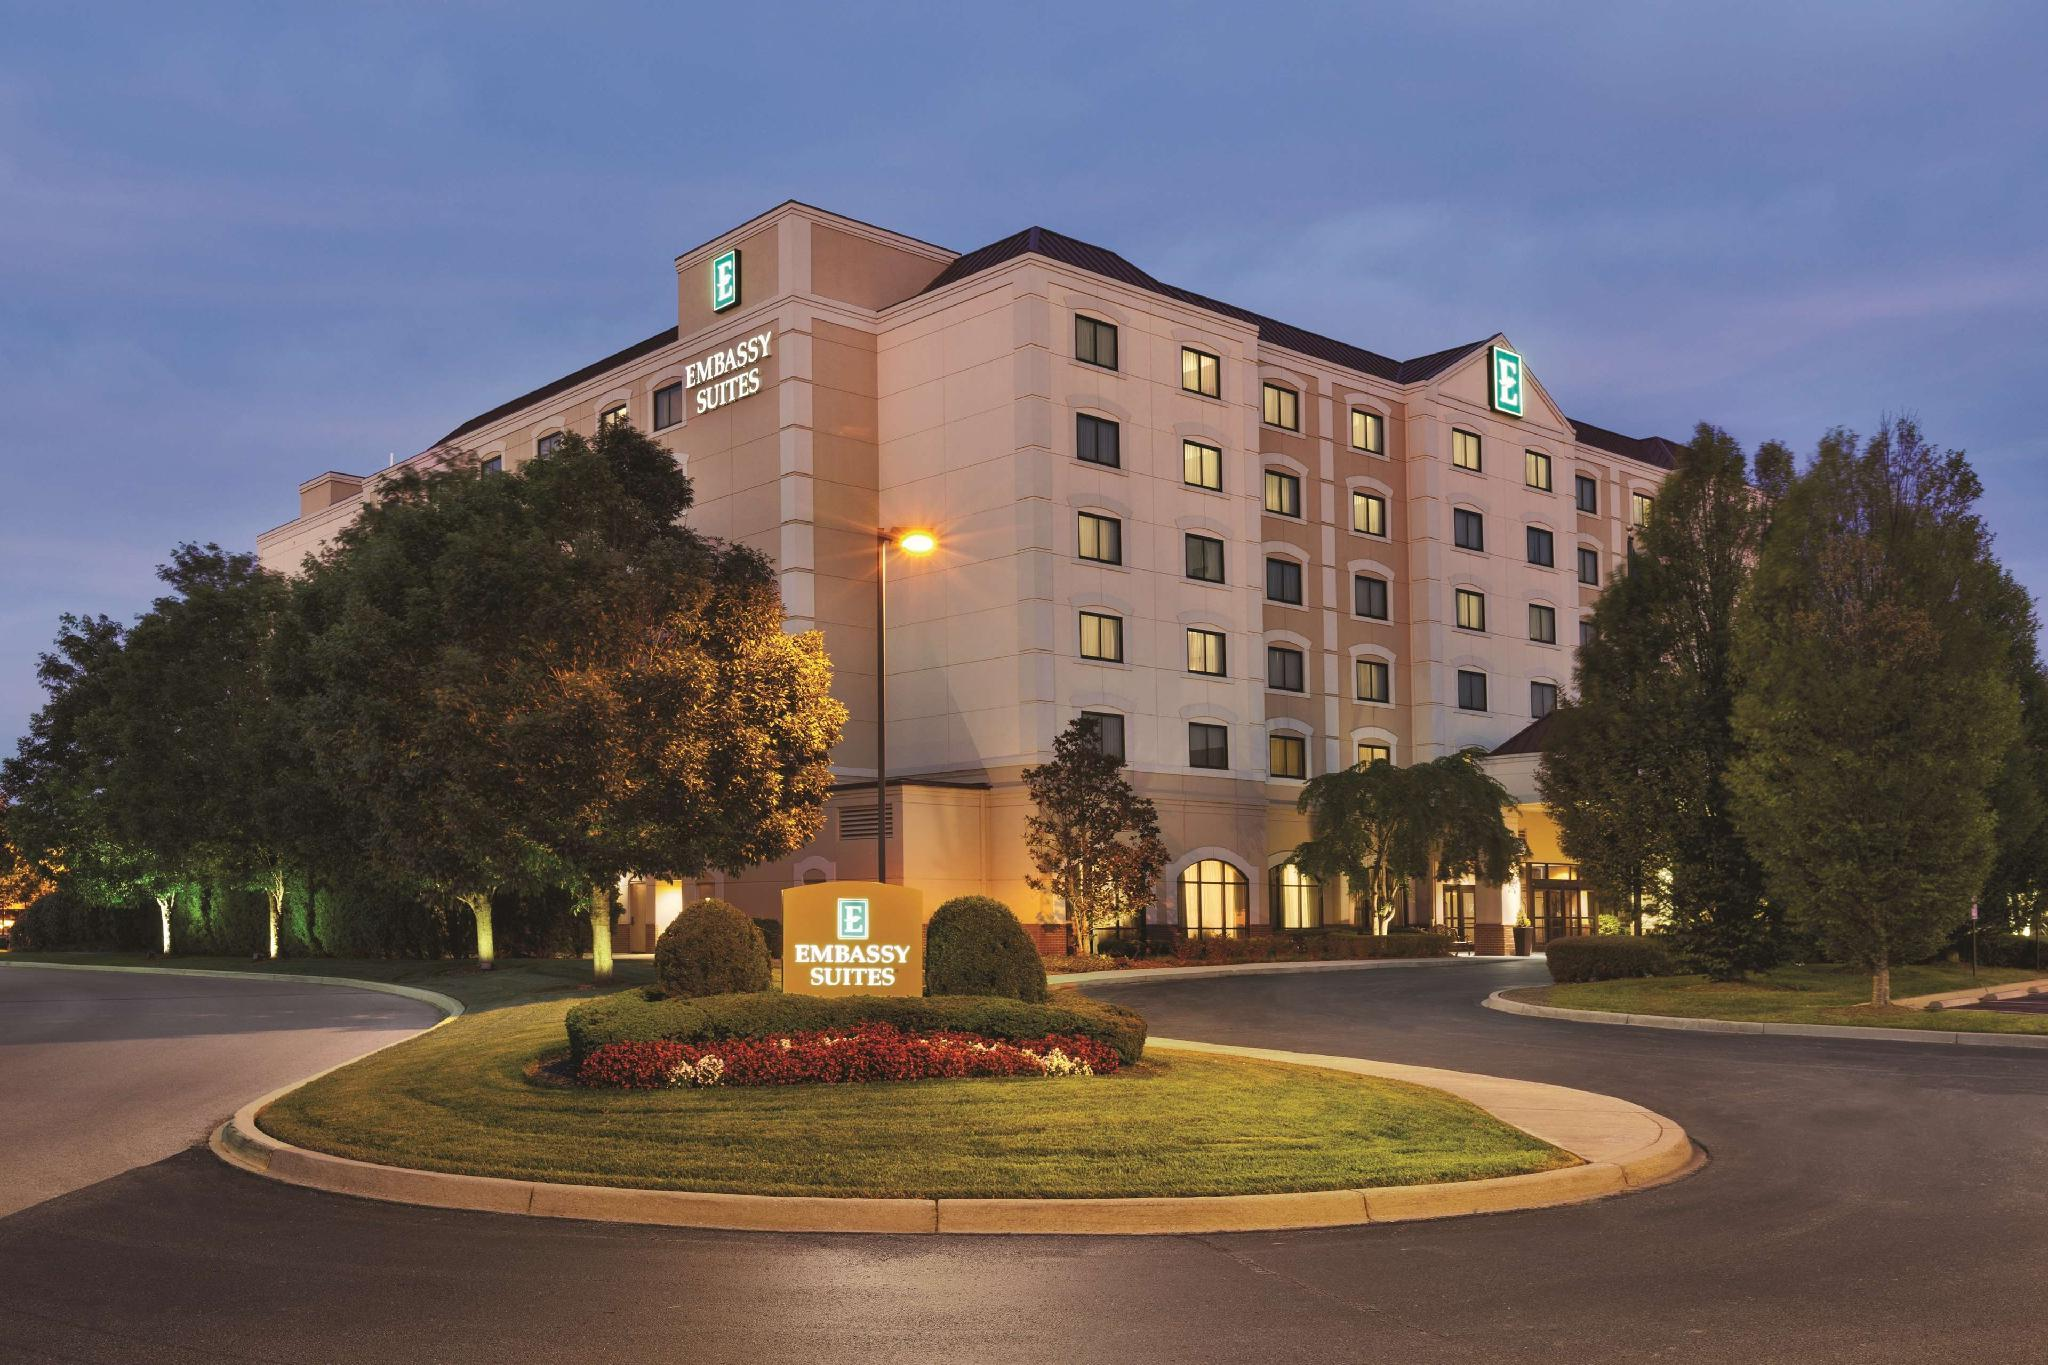 Embassy Suites Louisville